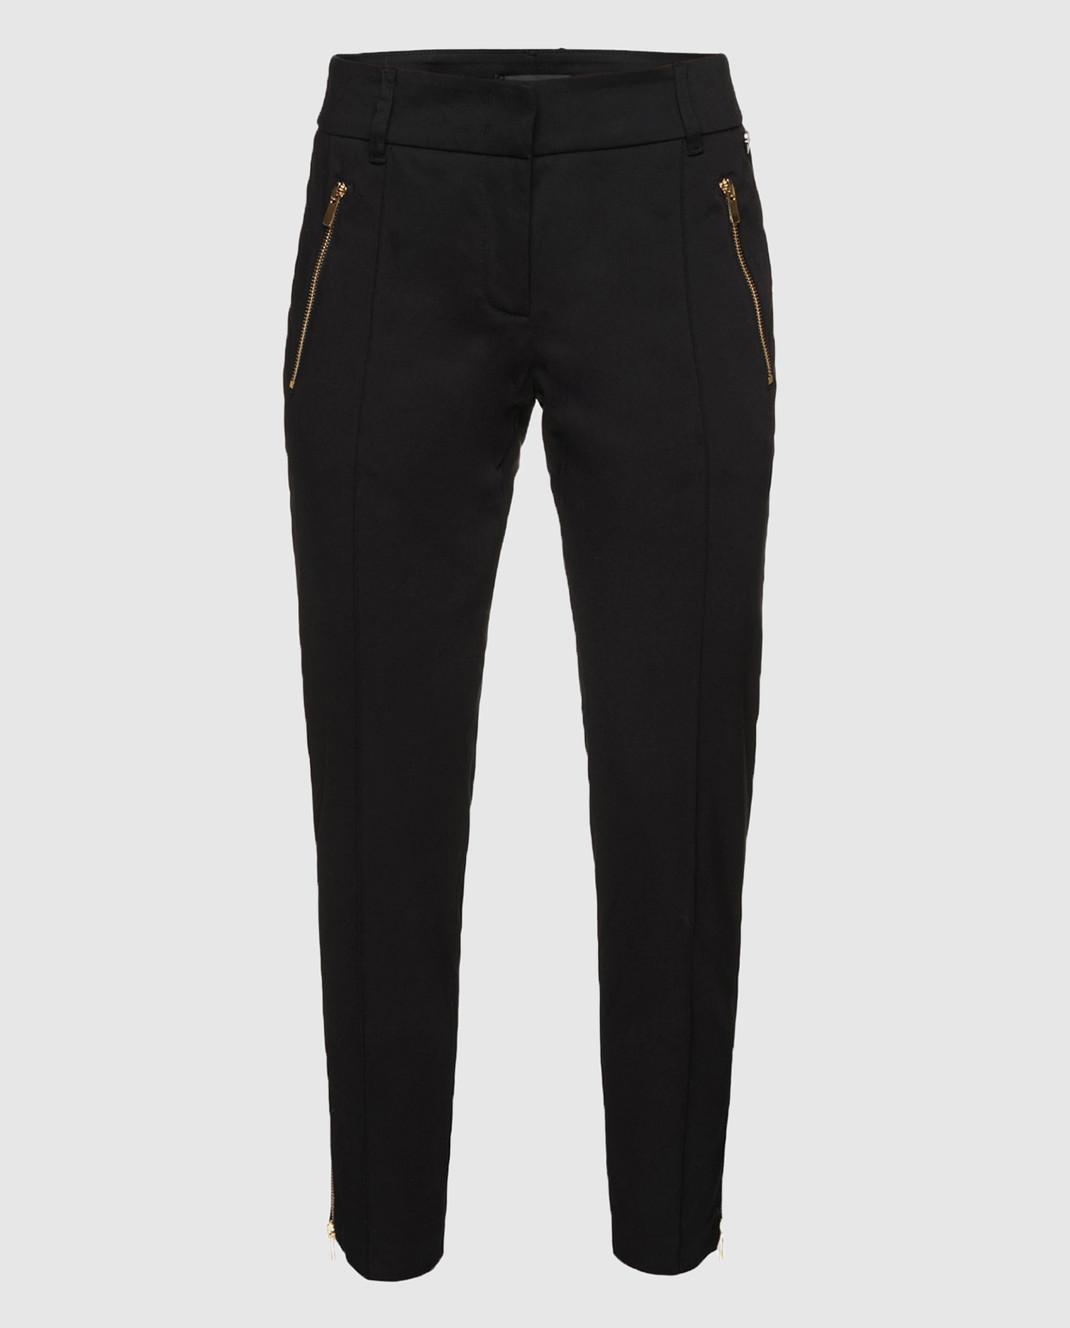 Twin Set Черные брюки TS826B